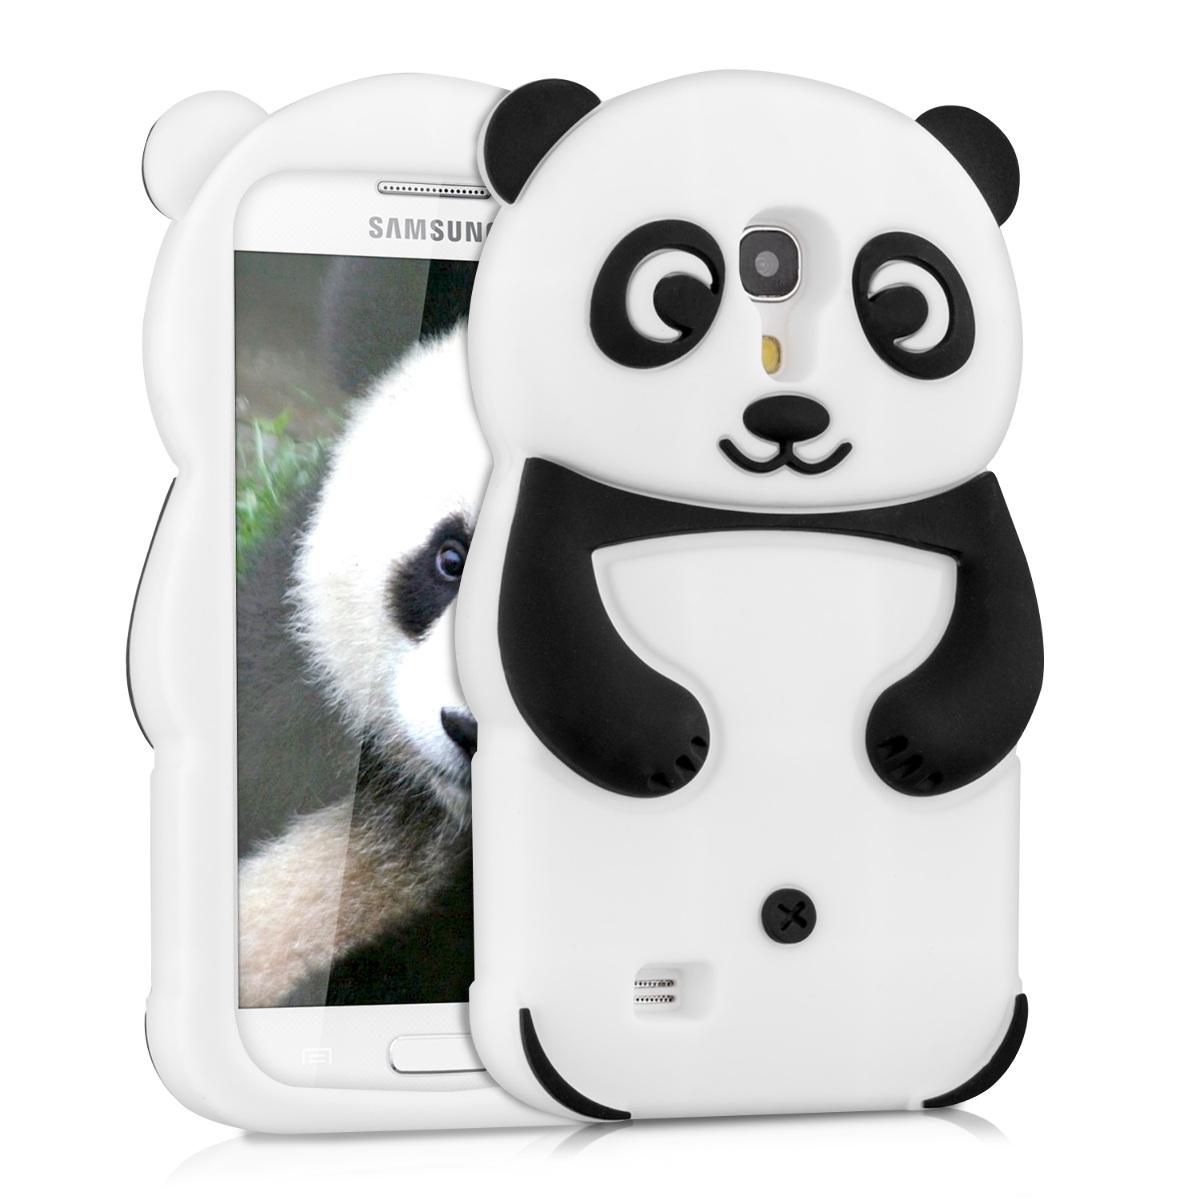 silicon cover panda for samsung galaxy s4 mini soft case. Black Bedroom Furniture Sets. Home Design Ideas